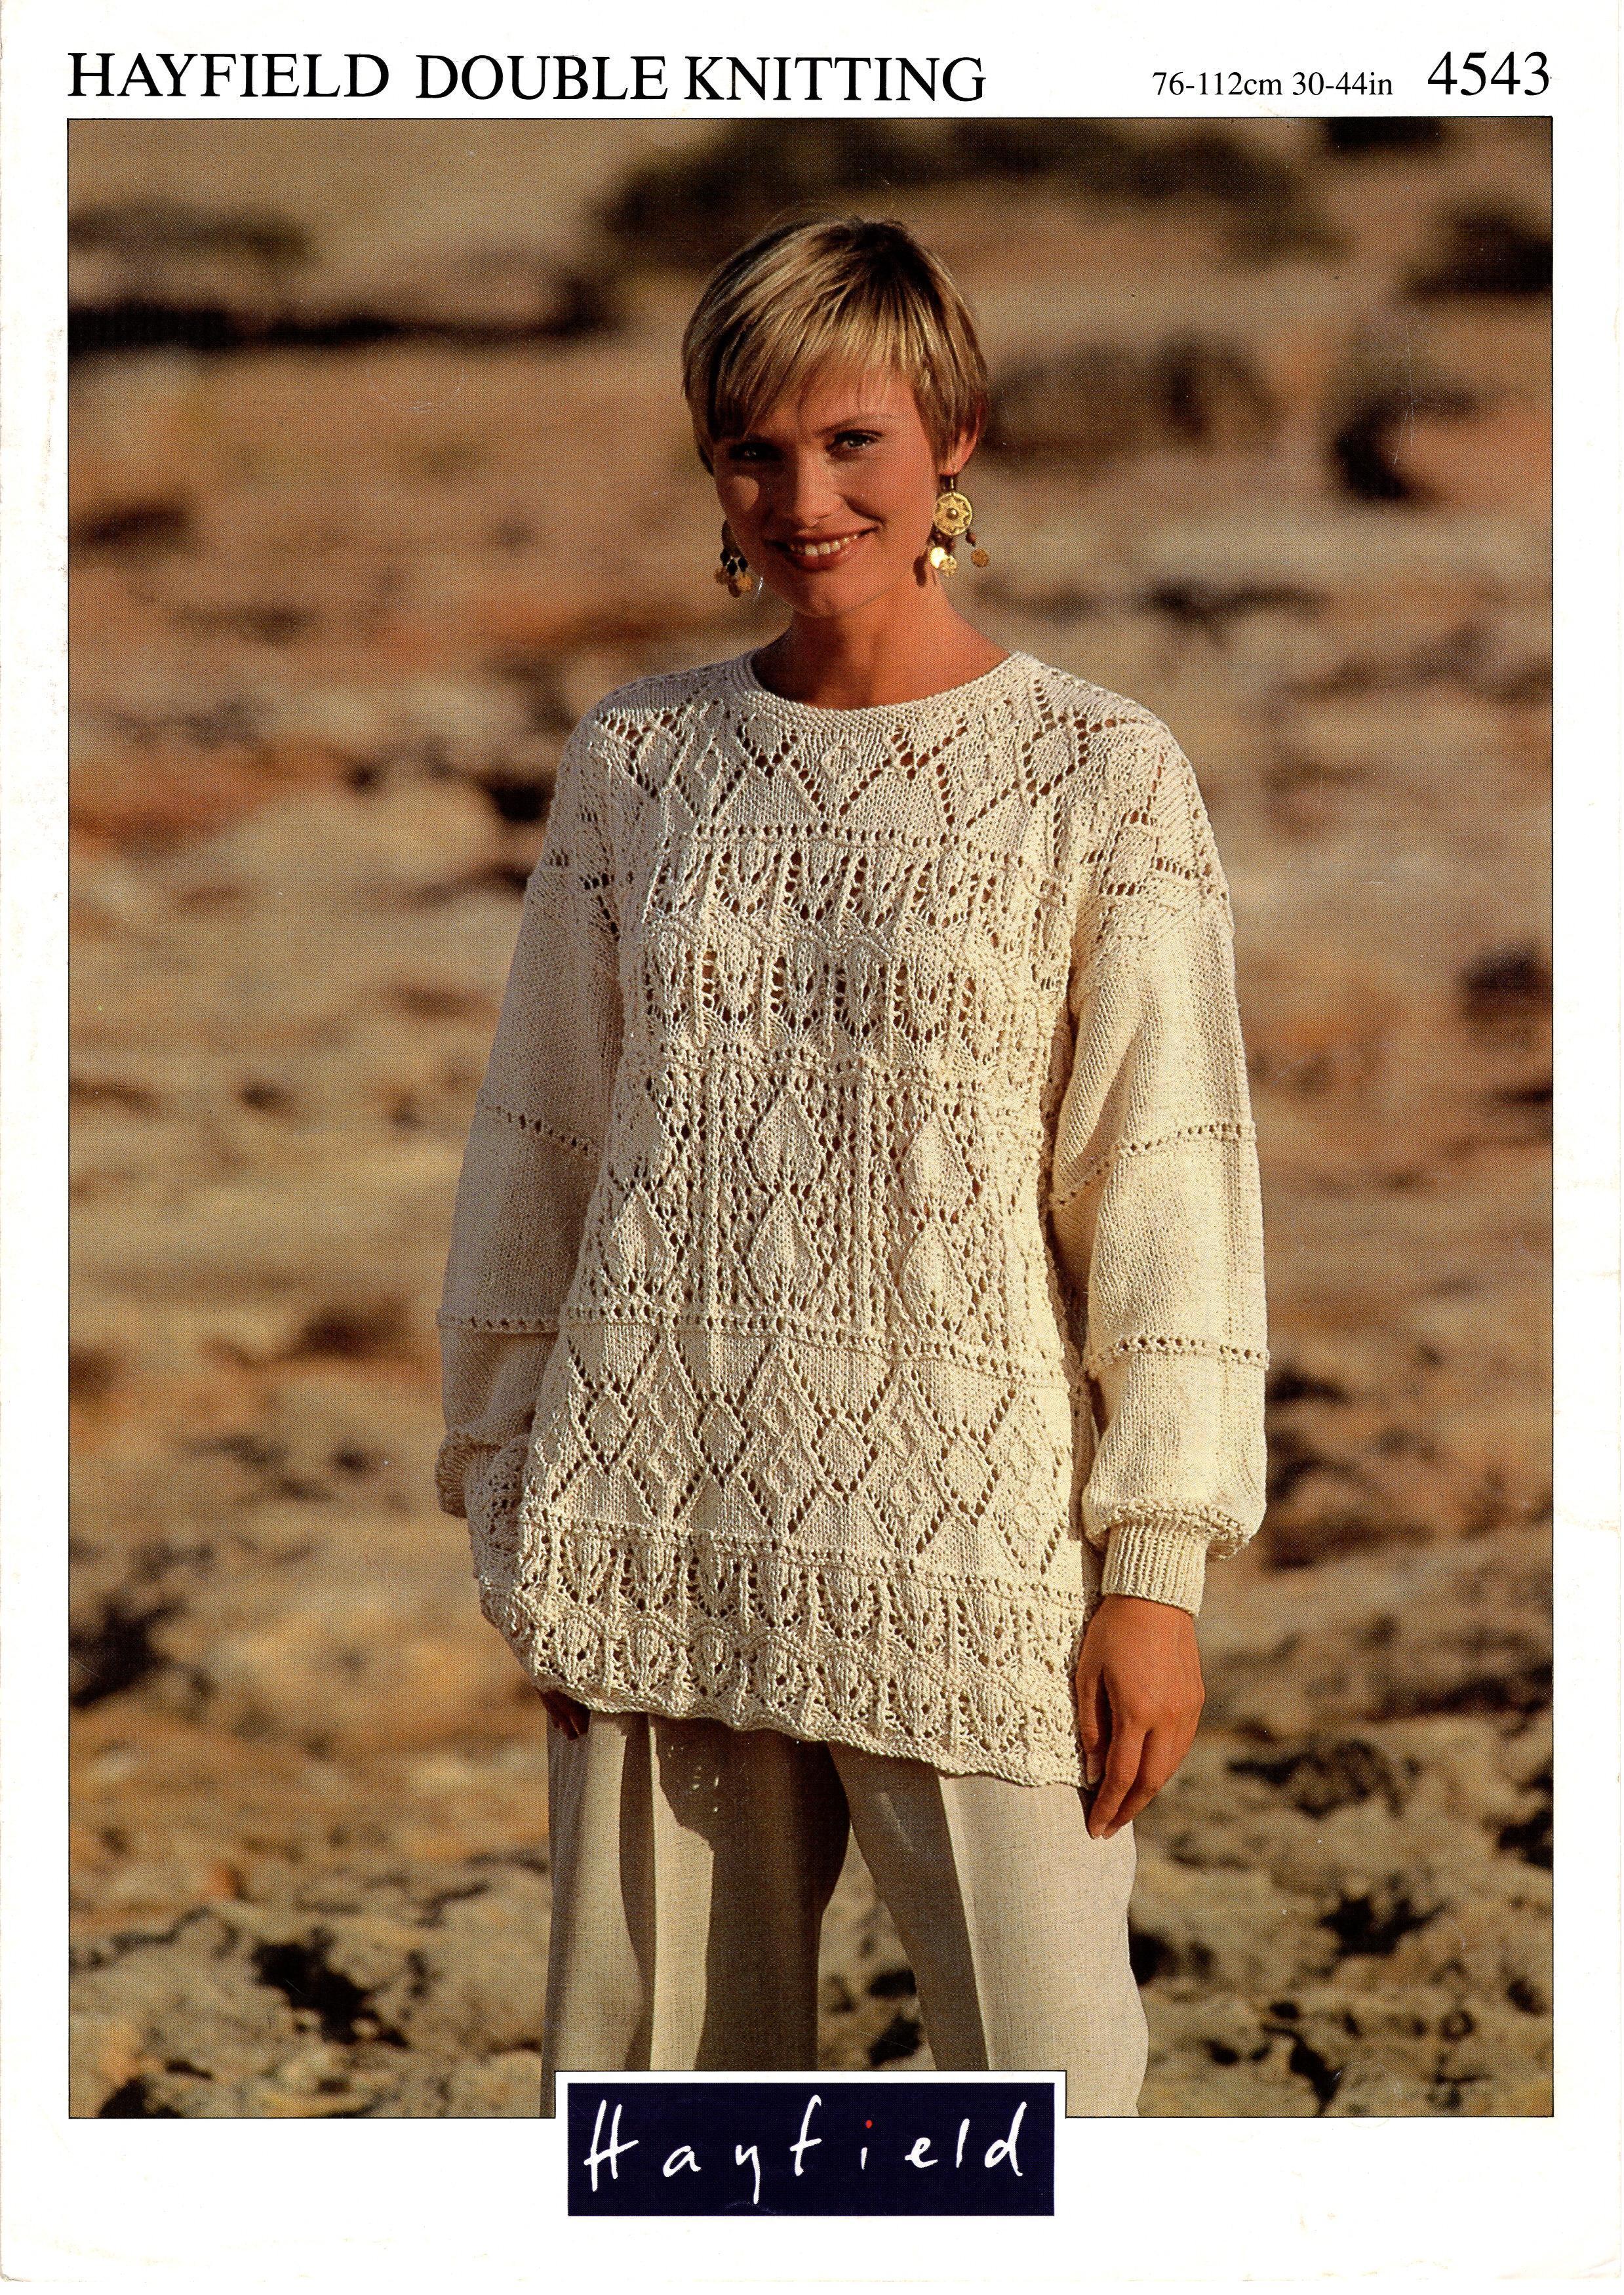 Hayfield Knitting Pattern Booklet No.4543 00028